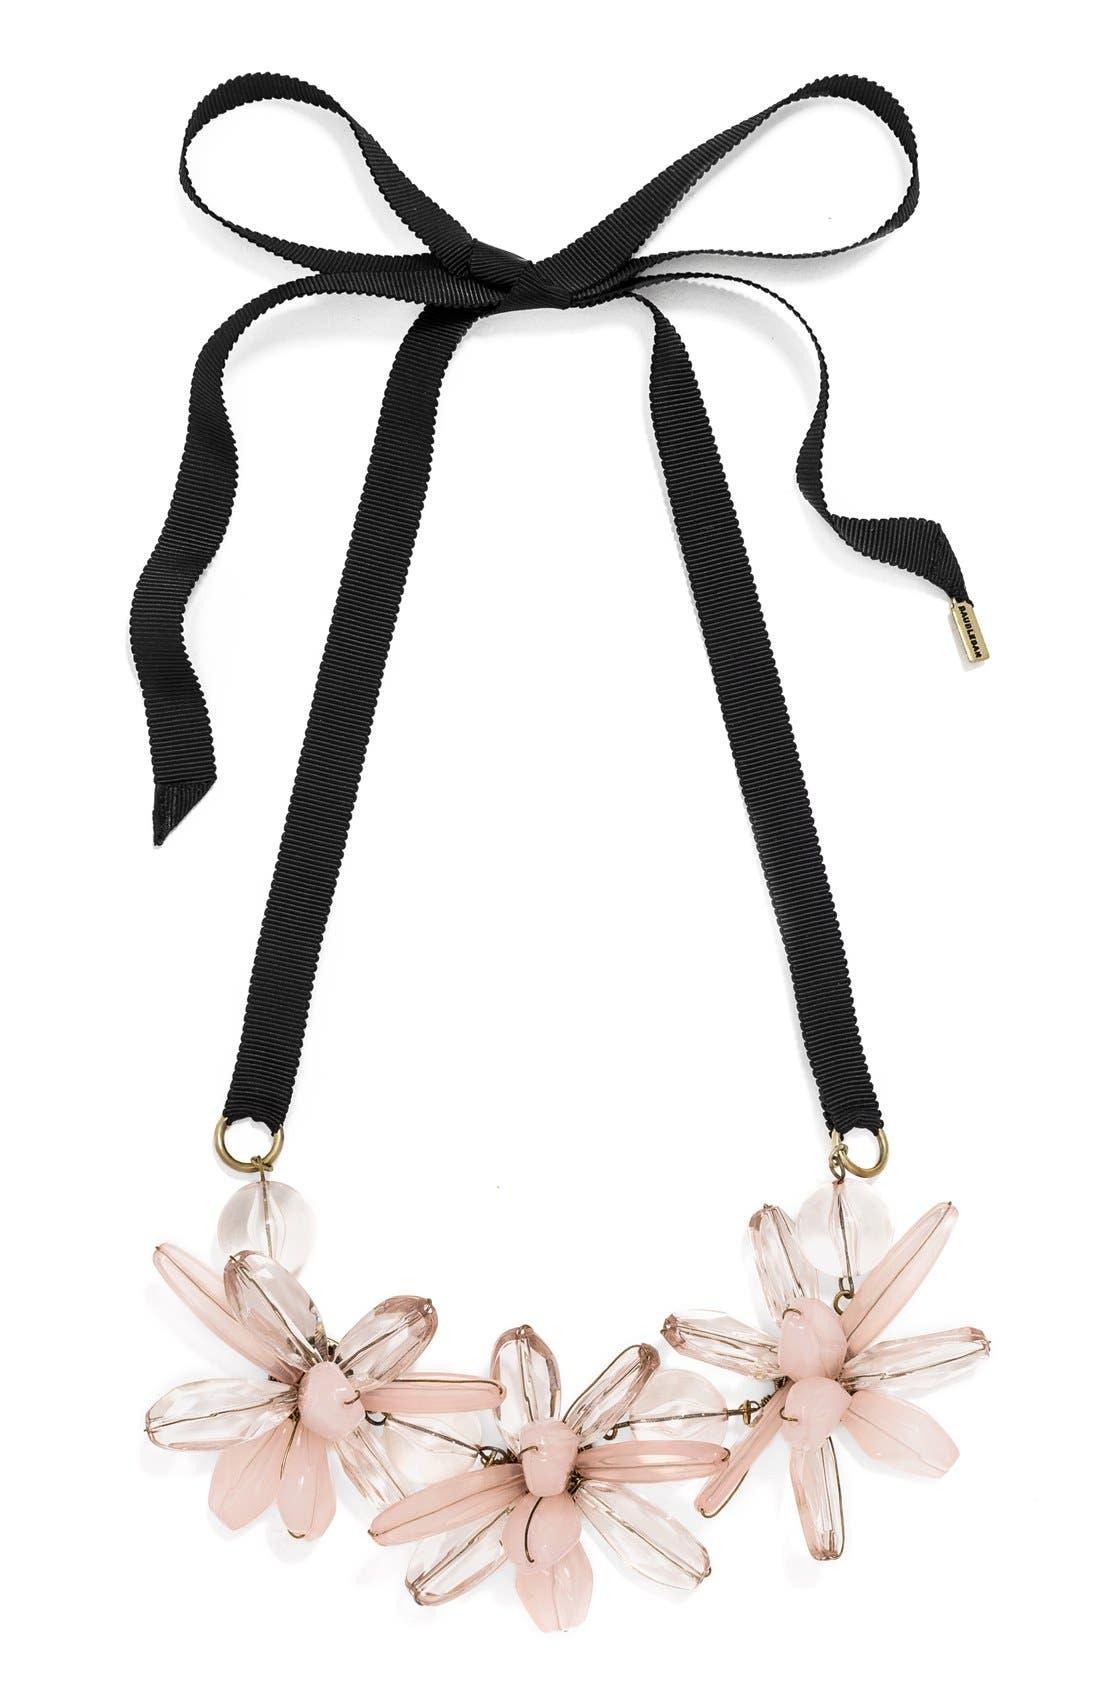 Alternate Image 1 Selected - BaubleBar 'Plumeria' Collar Necklace